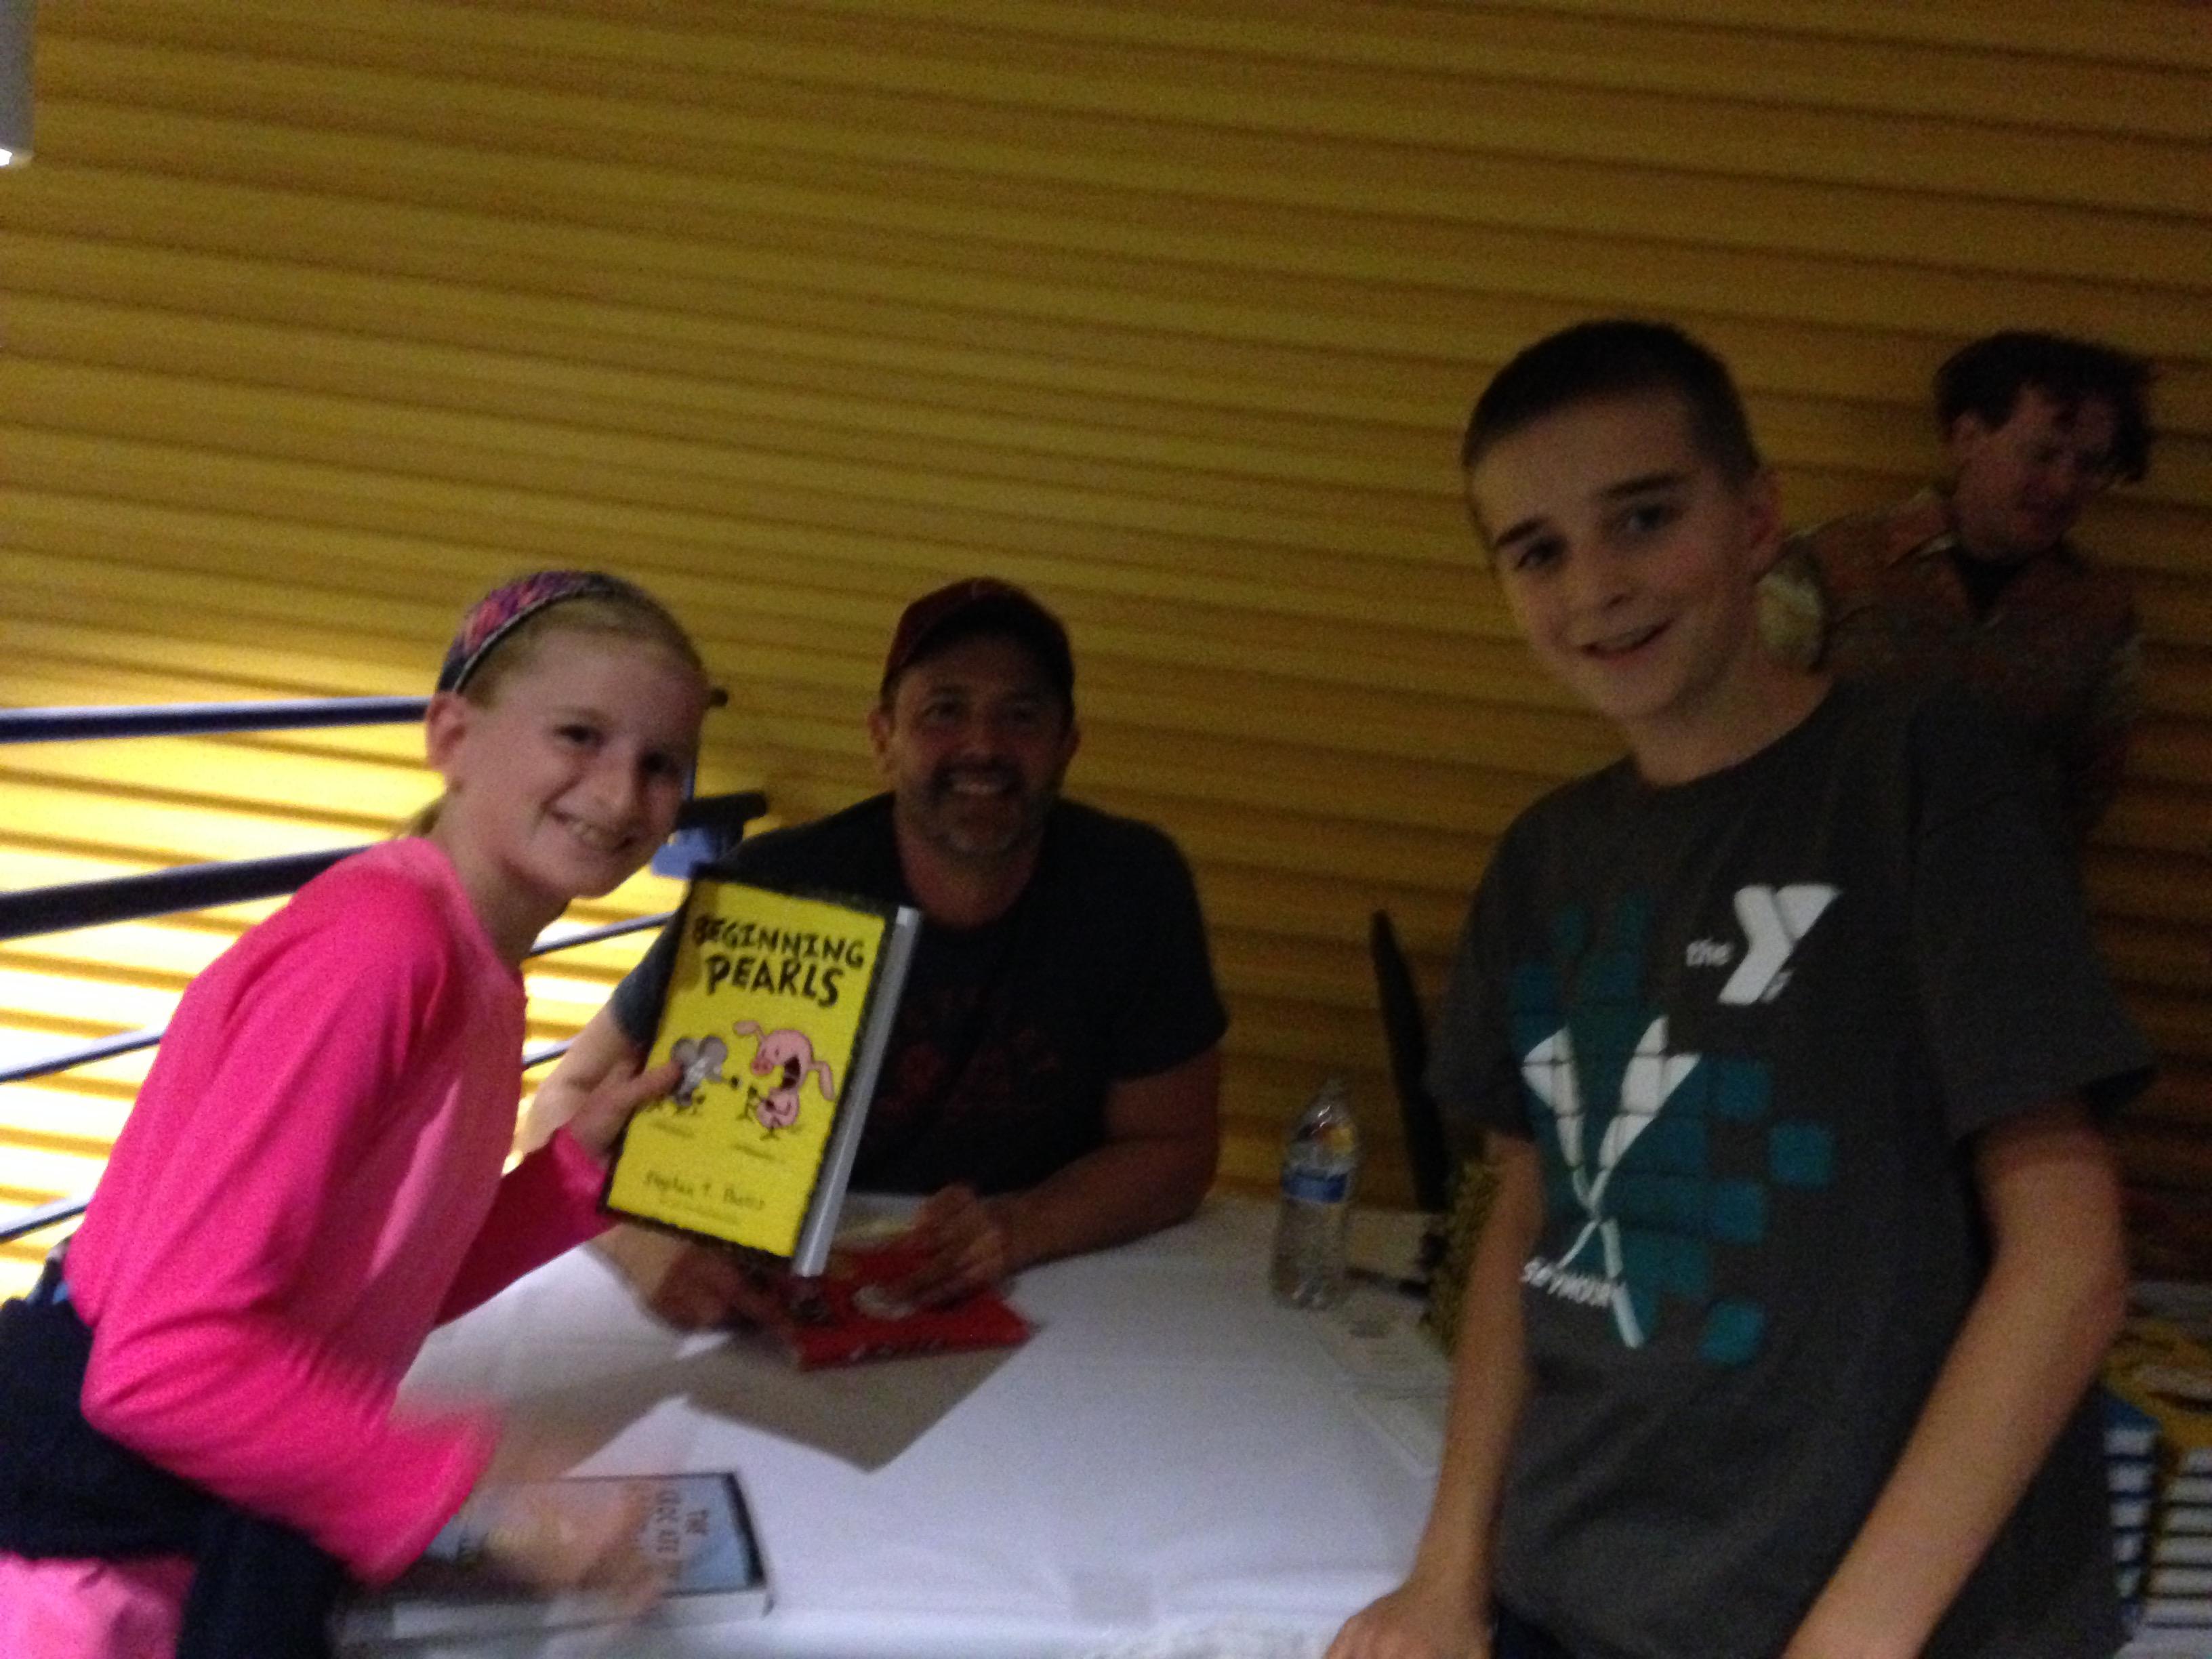 Meeting Stephan Patsis